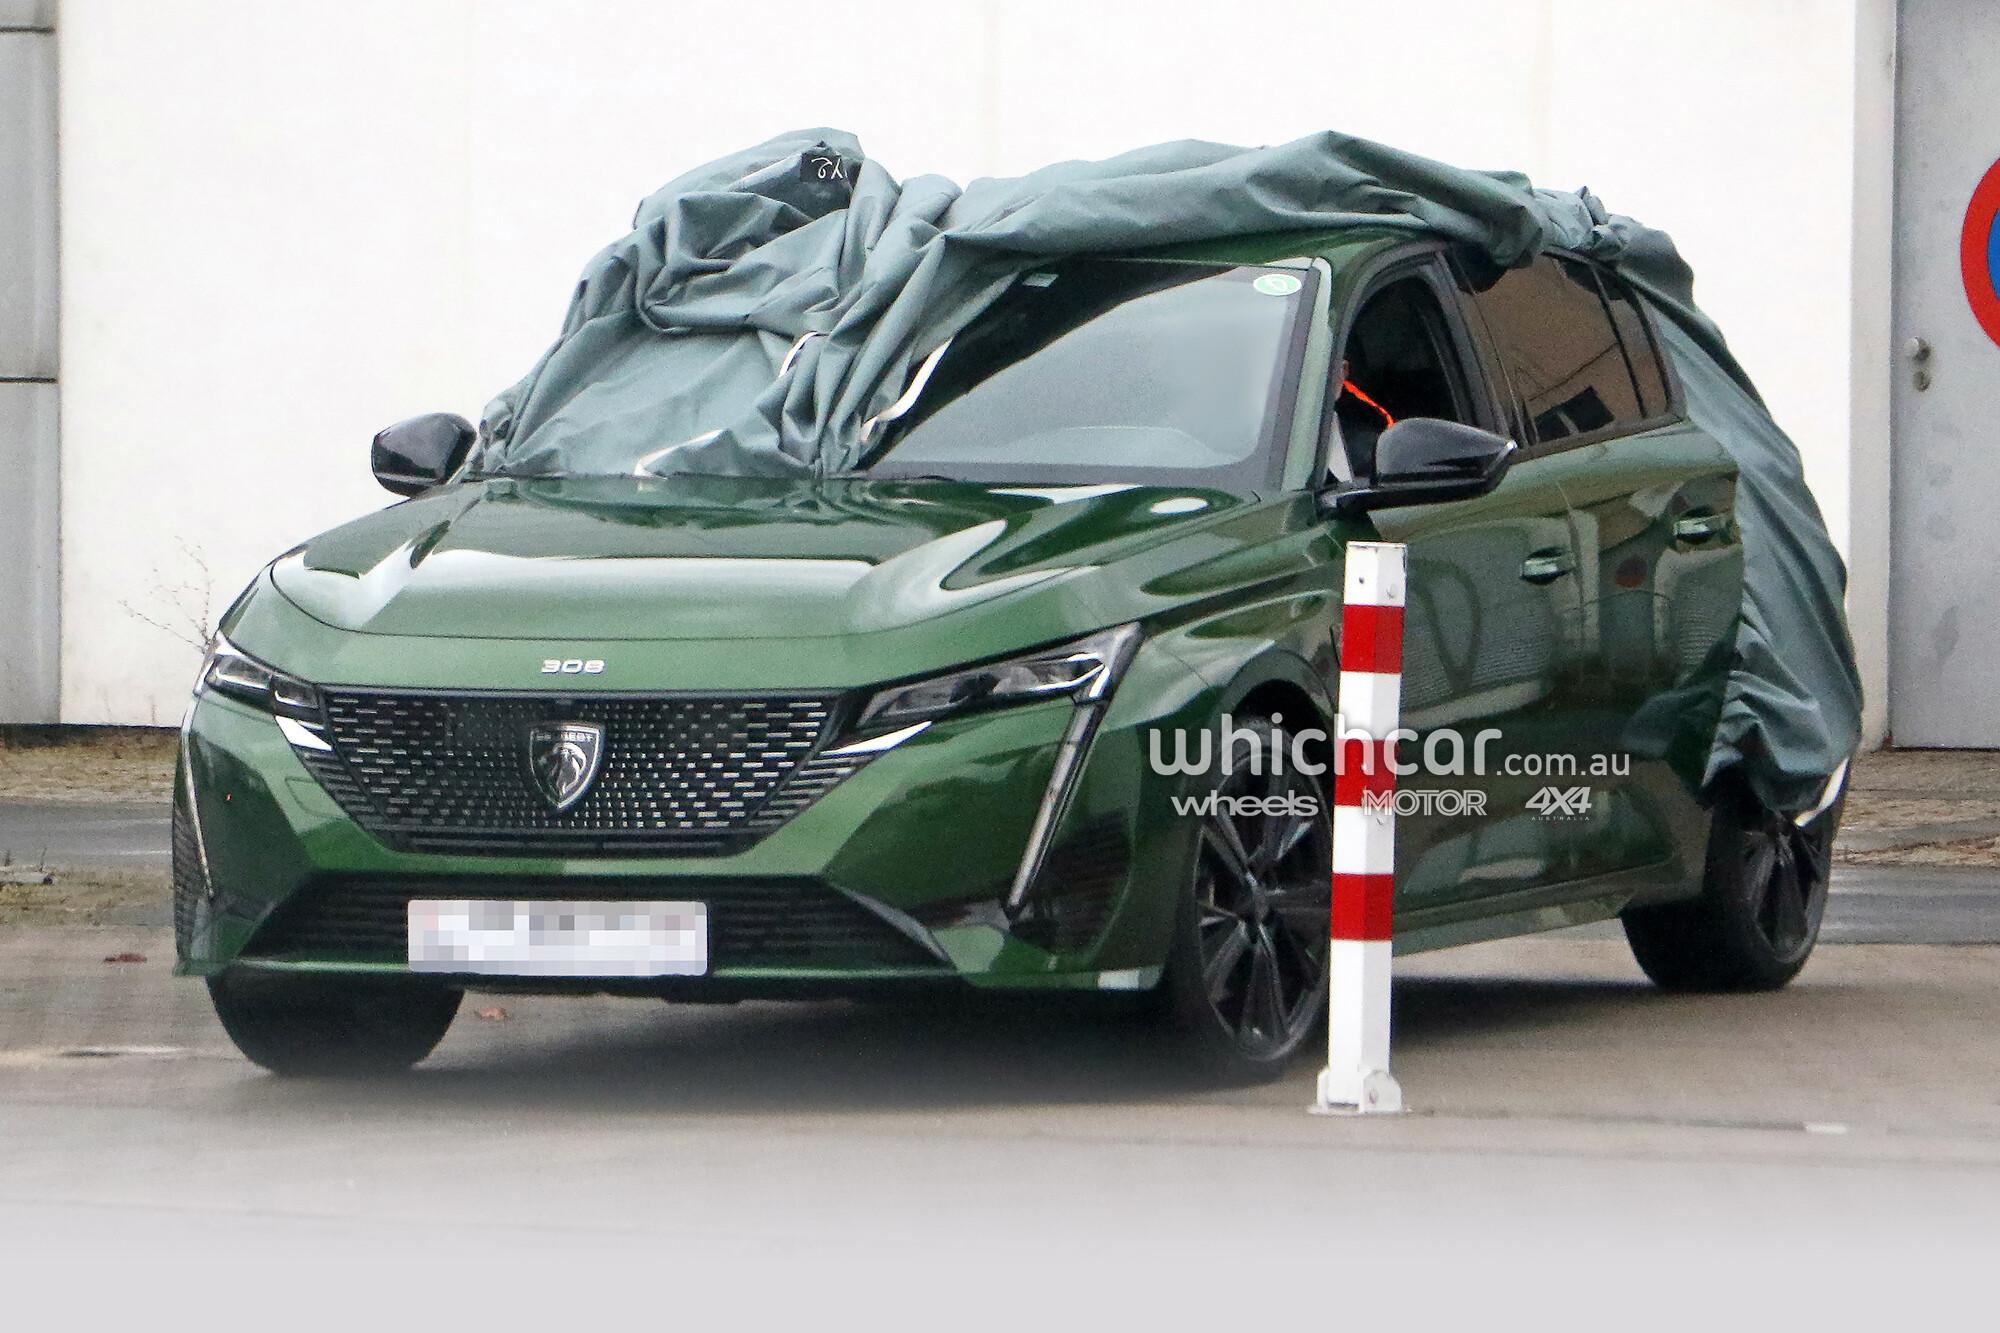 2022 Peugeot 308 Spy Photos Carpix Whichcar 3 Jpg